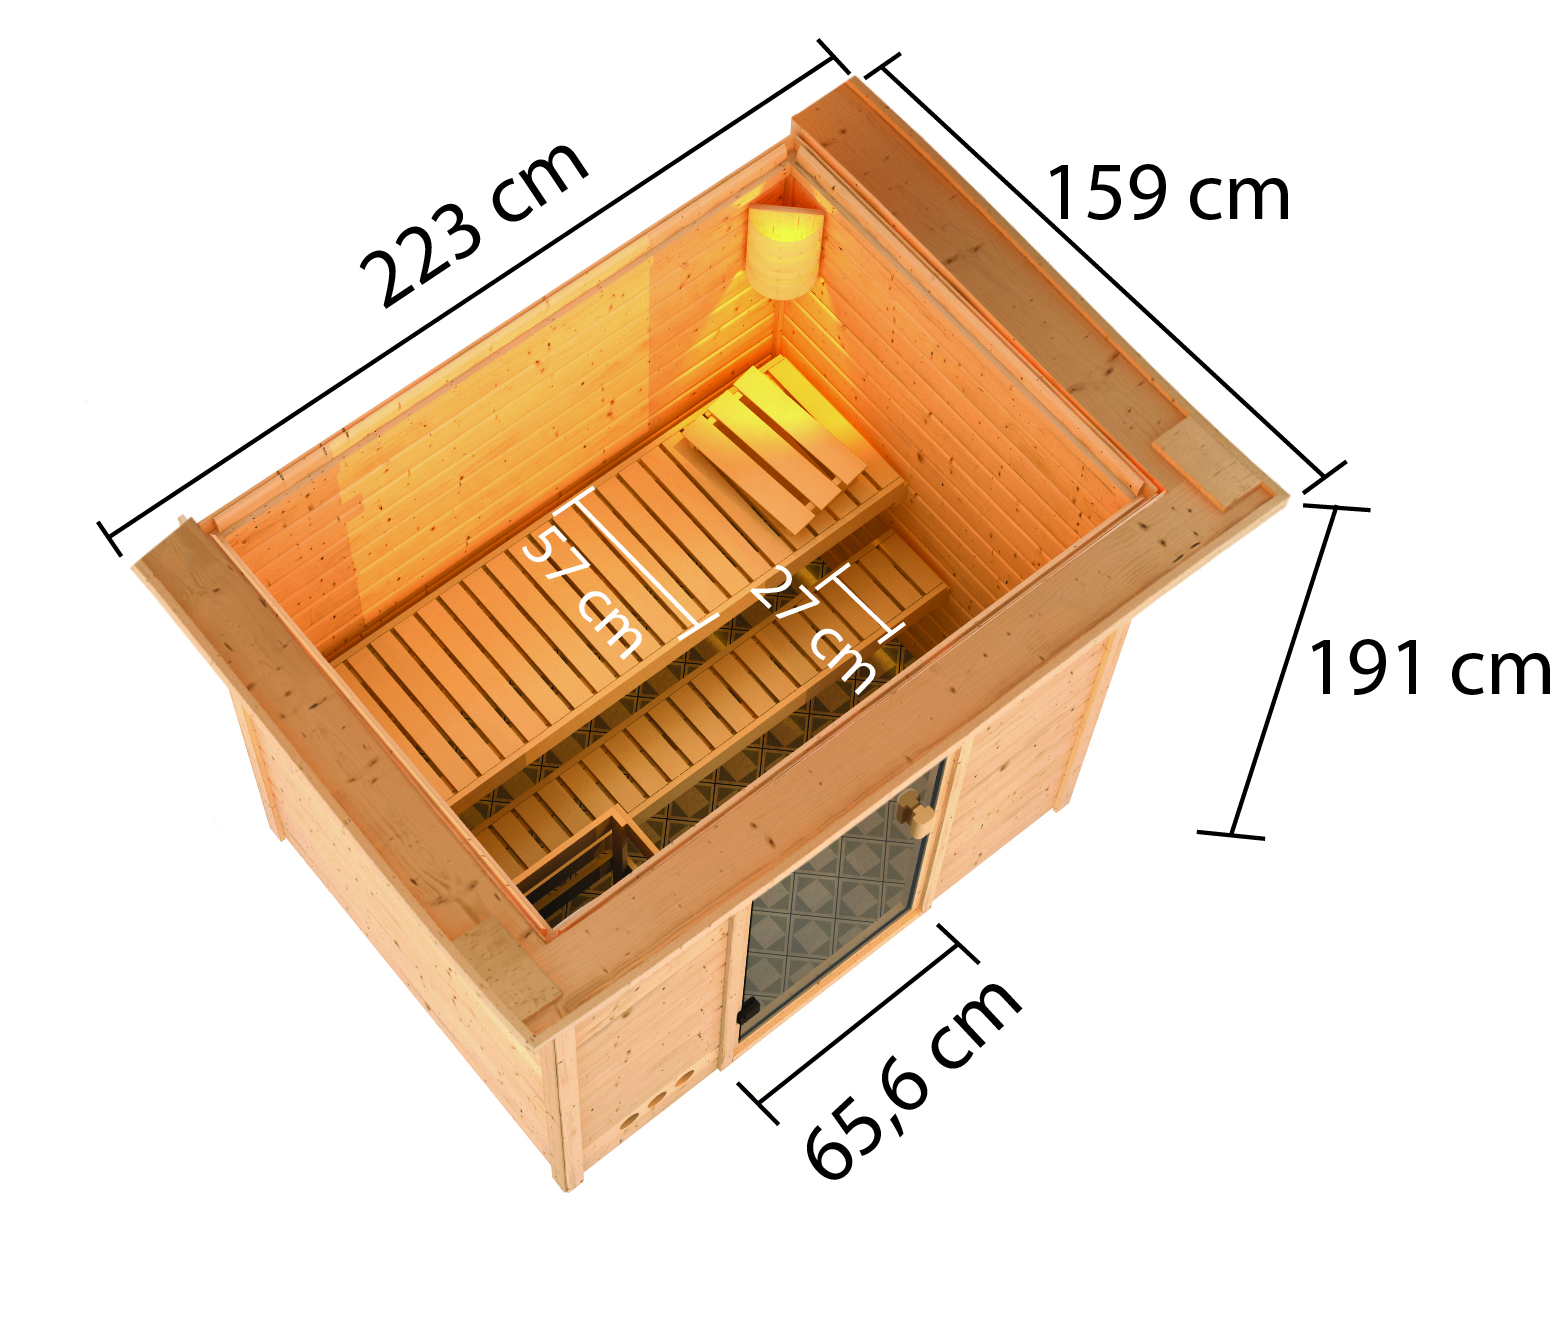 Woodfeeling Sauna Selena 38mm Dachkranz ohne Saunaofen Bild 3